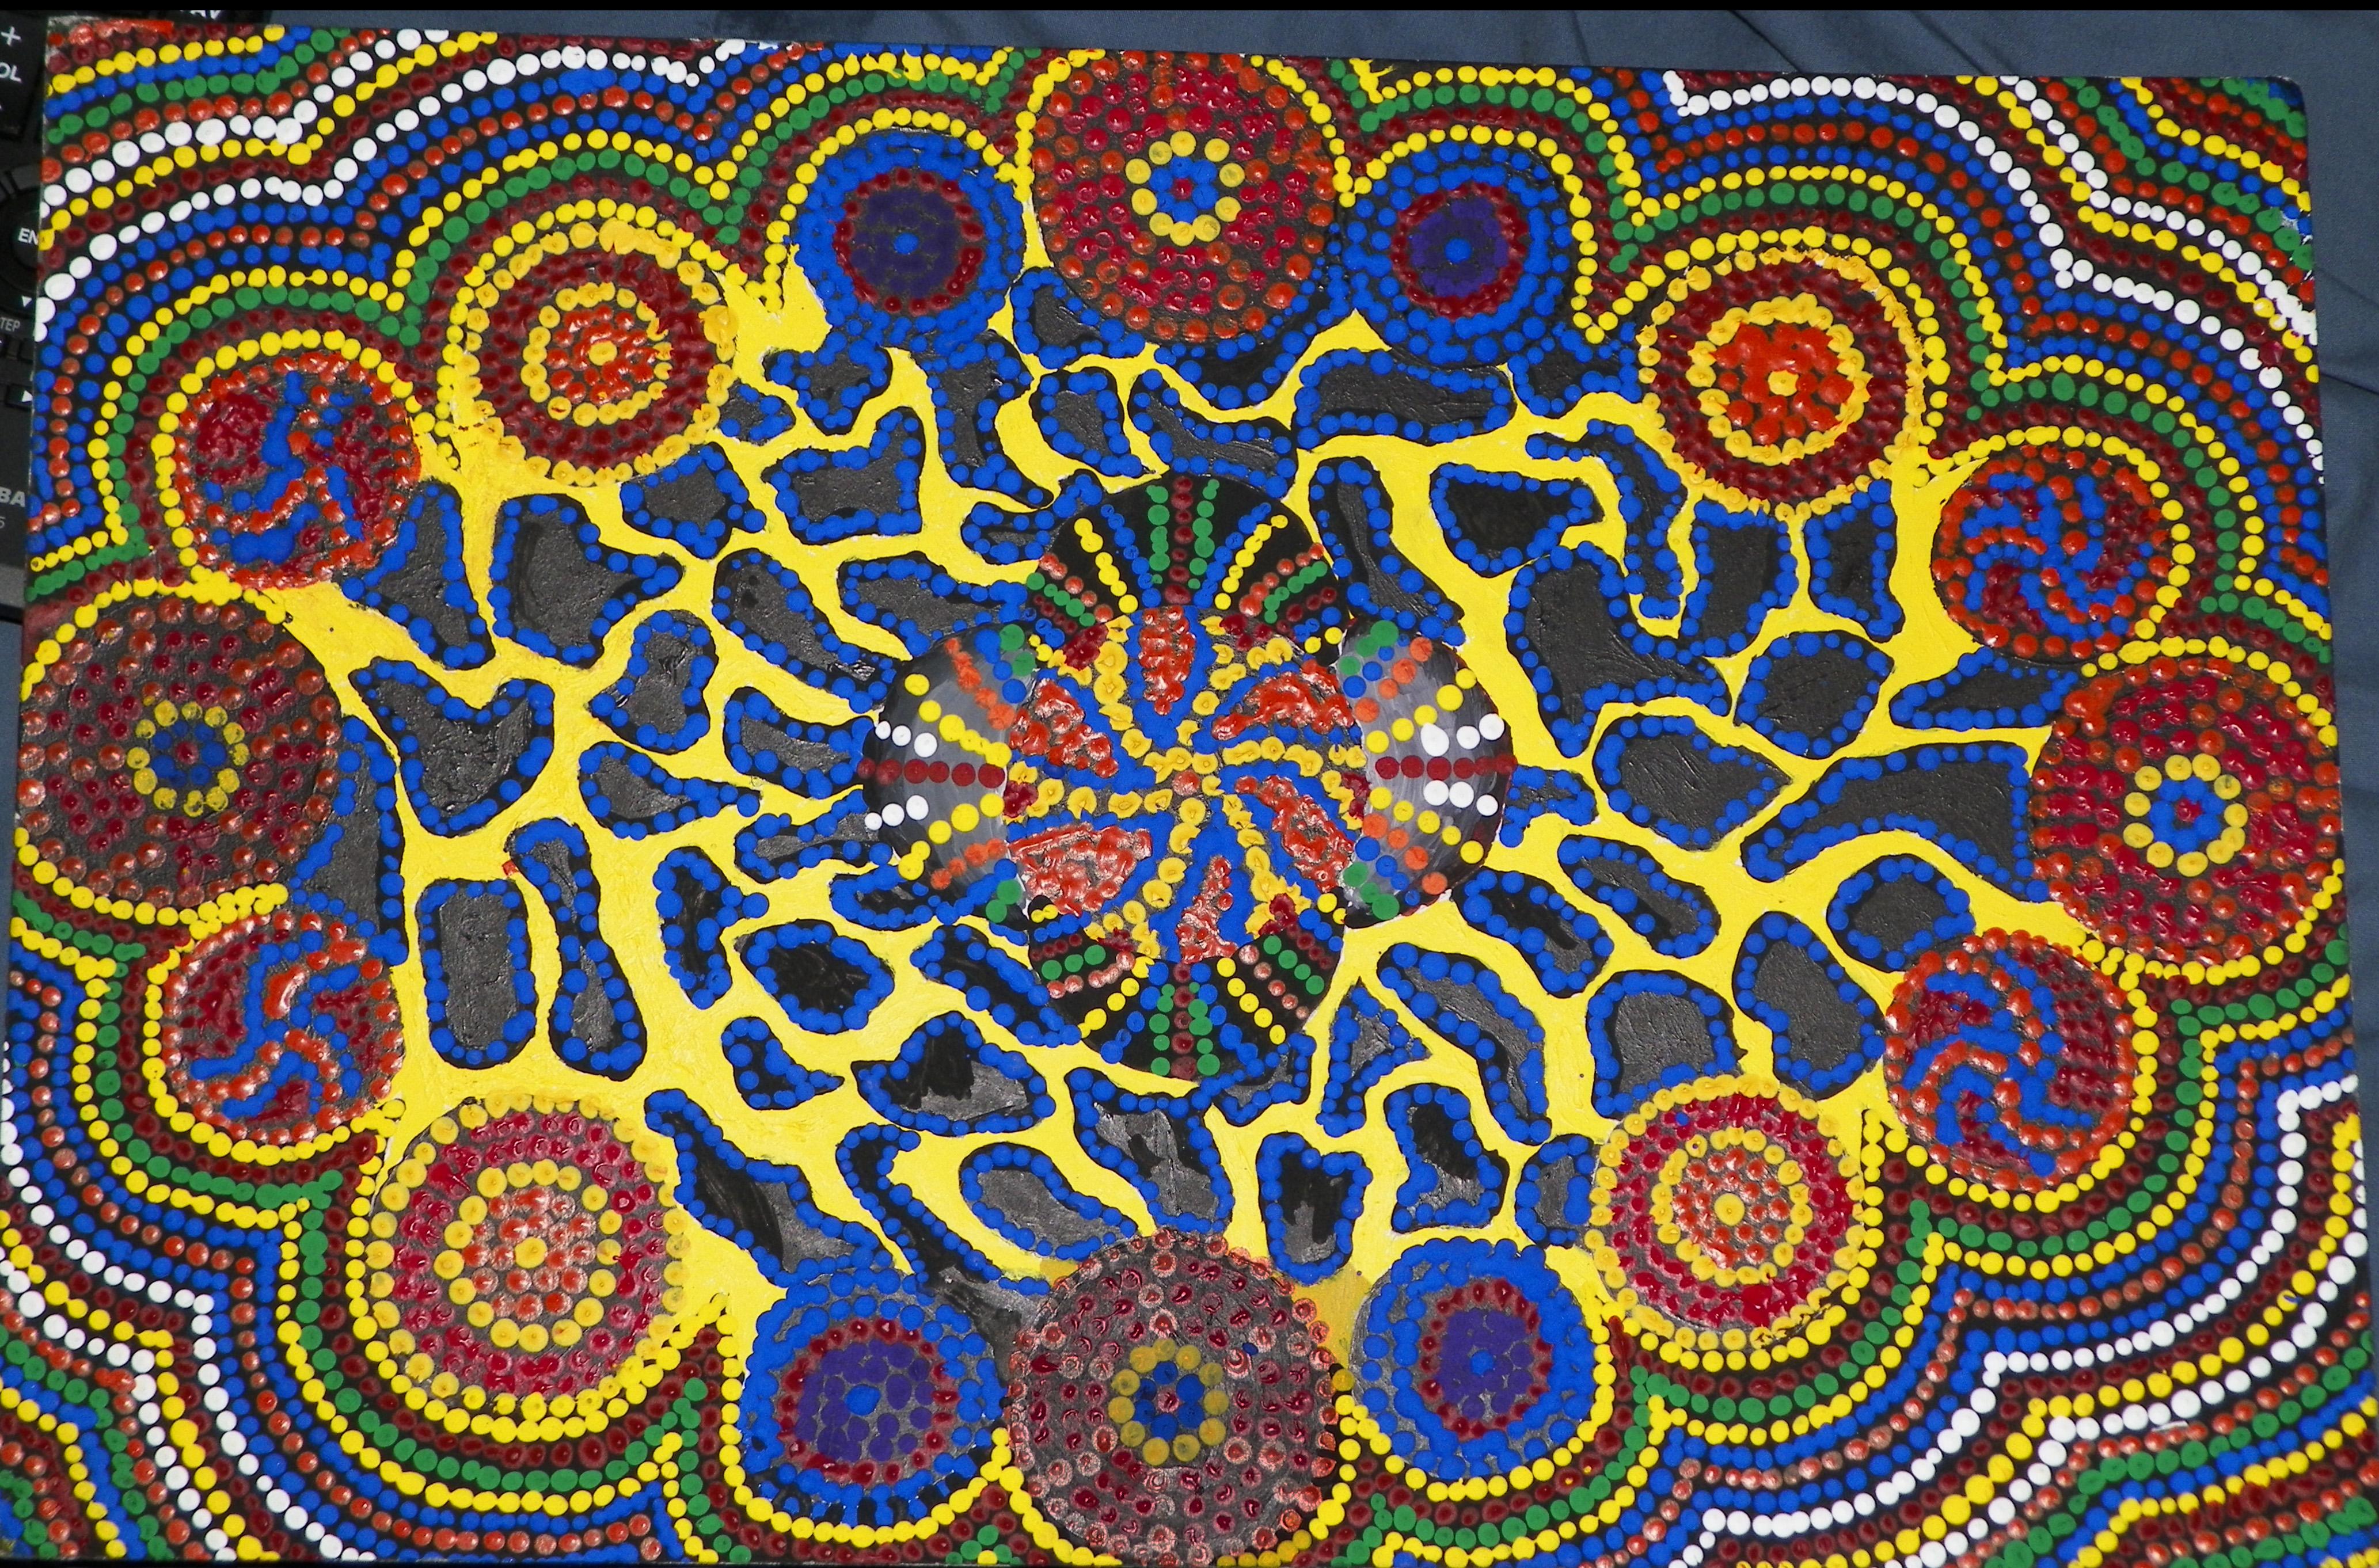 Aboriginal Design Wallpaper : Aboriginal art of australia by desperationanxiety on